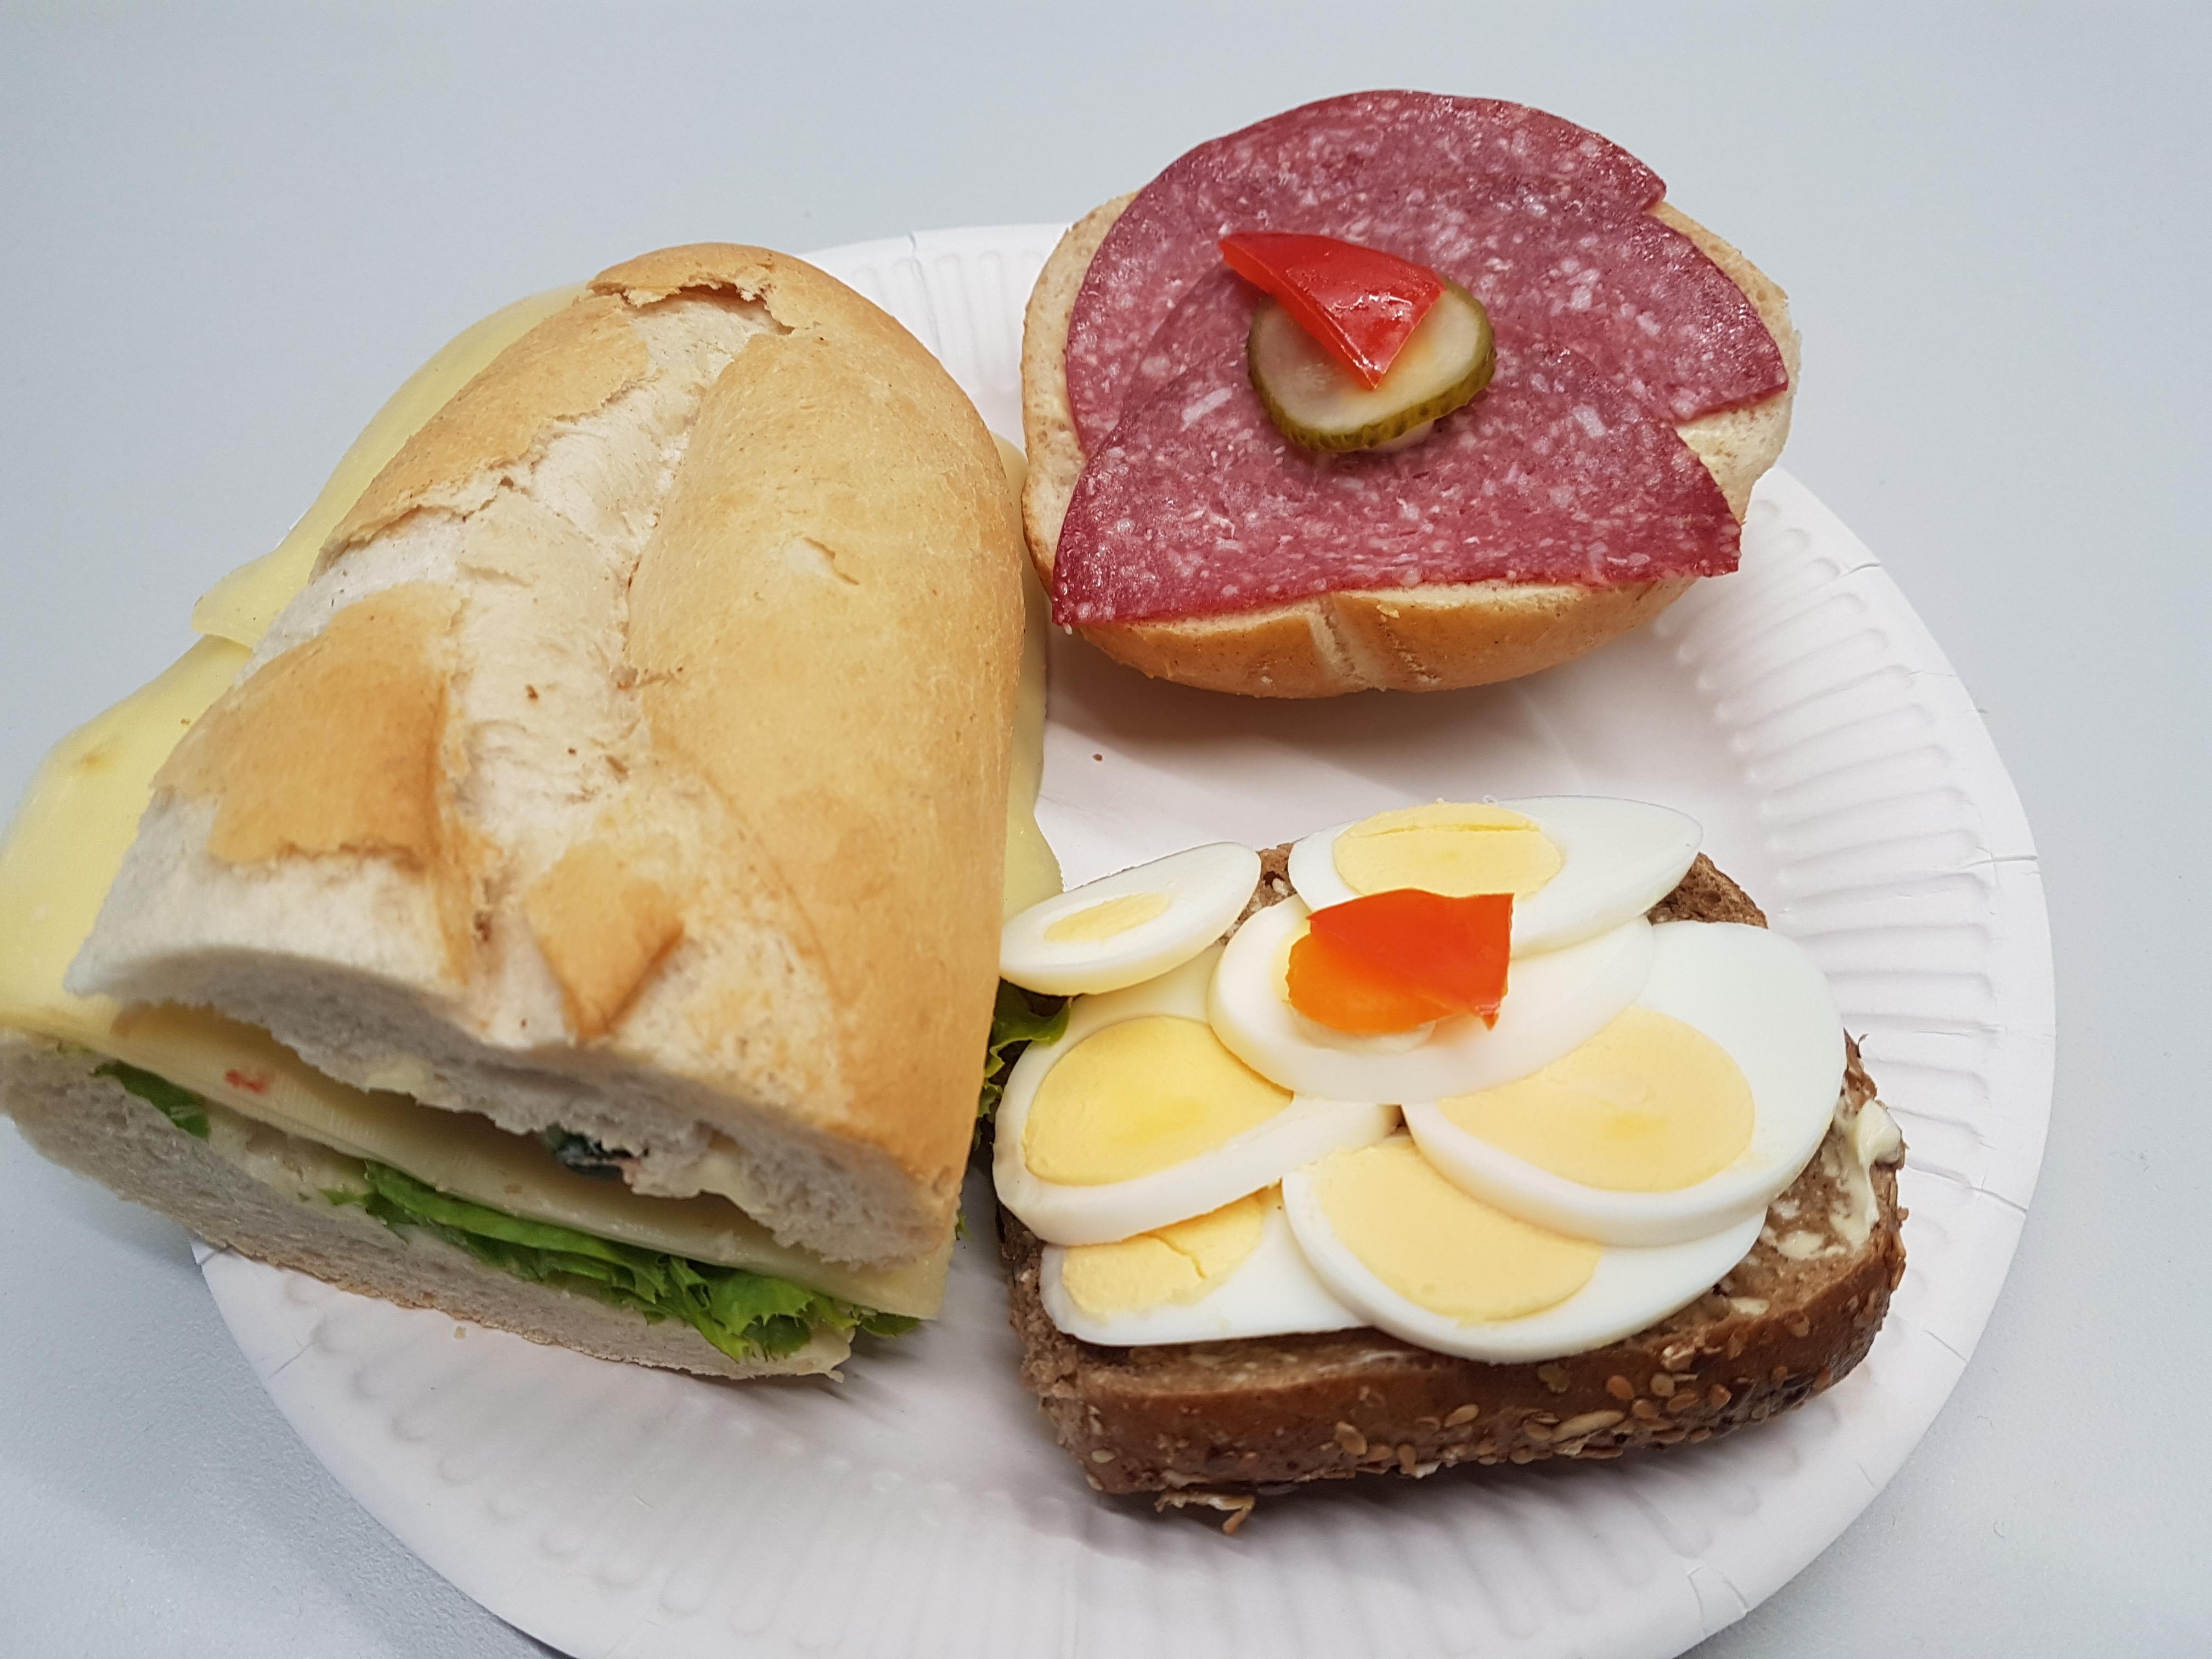 http://foodloader.net/Holz_2018-08-09_Snacks.jpg